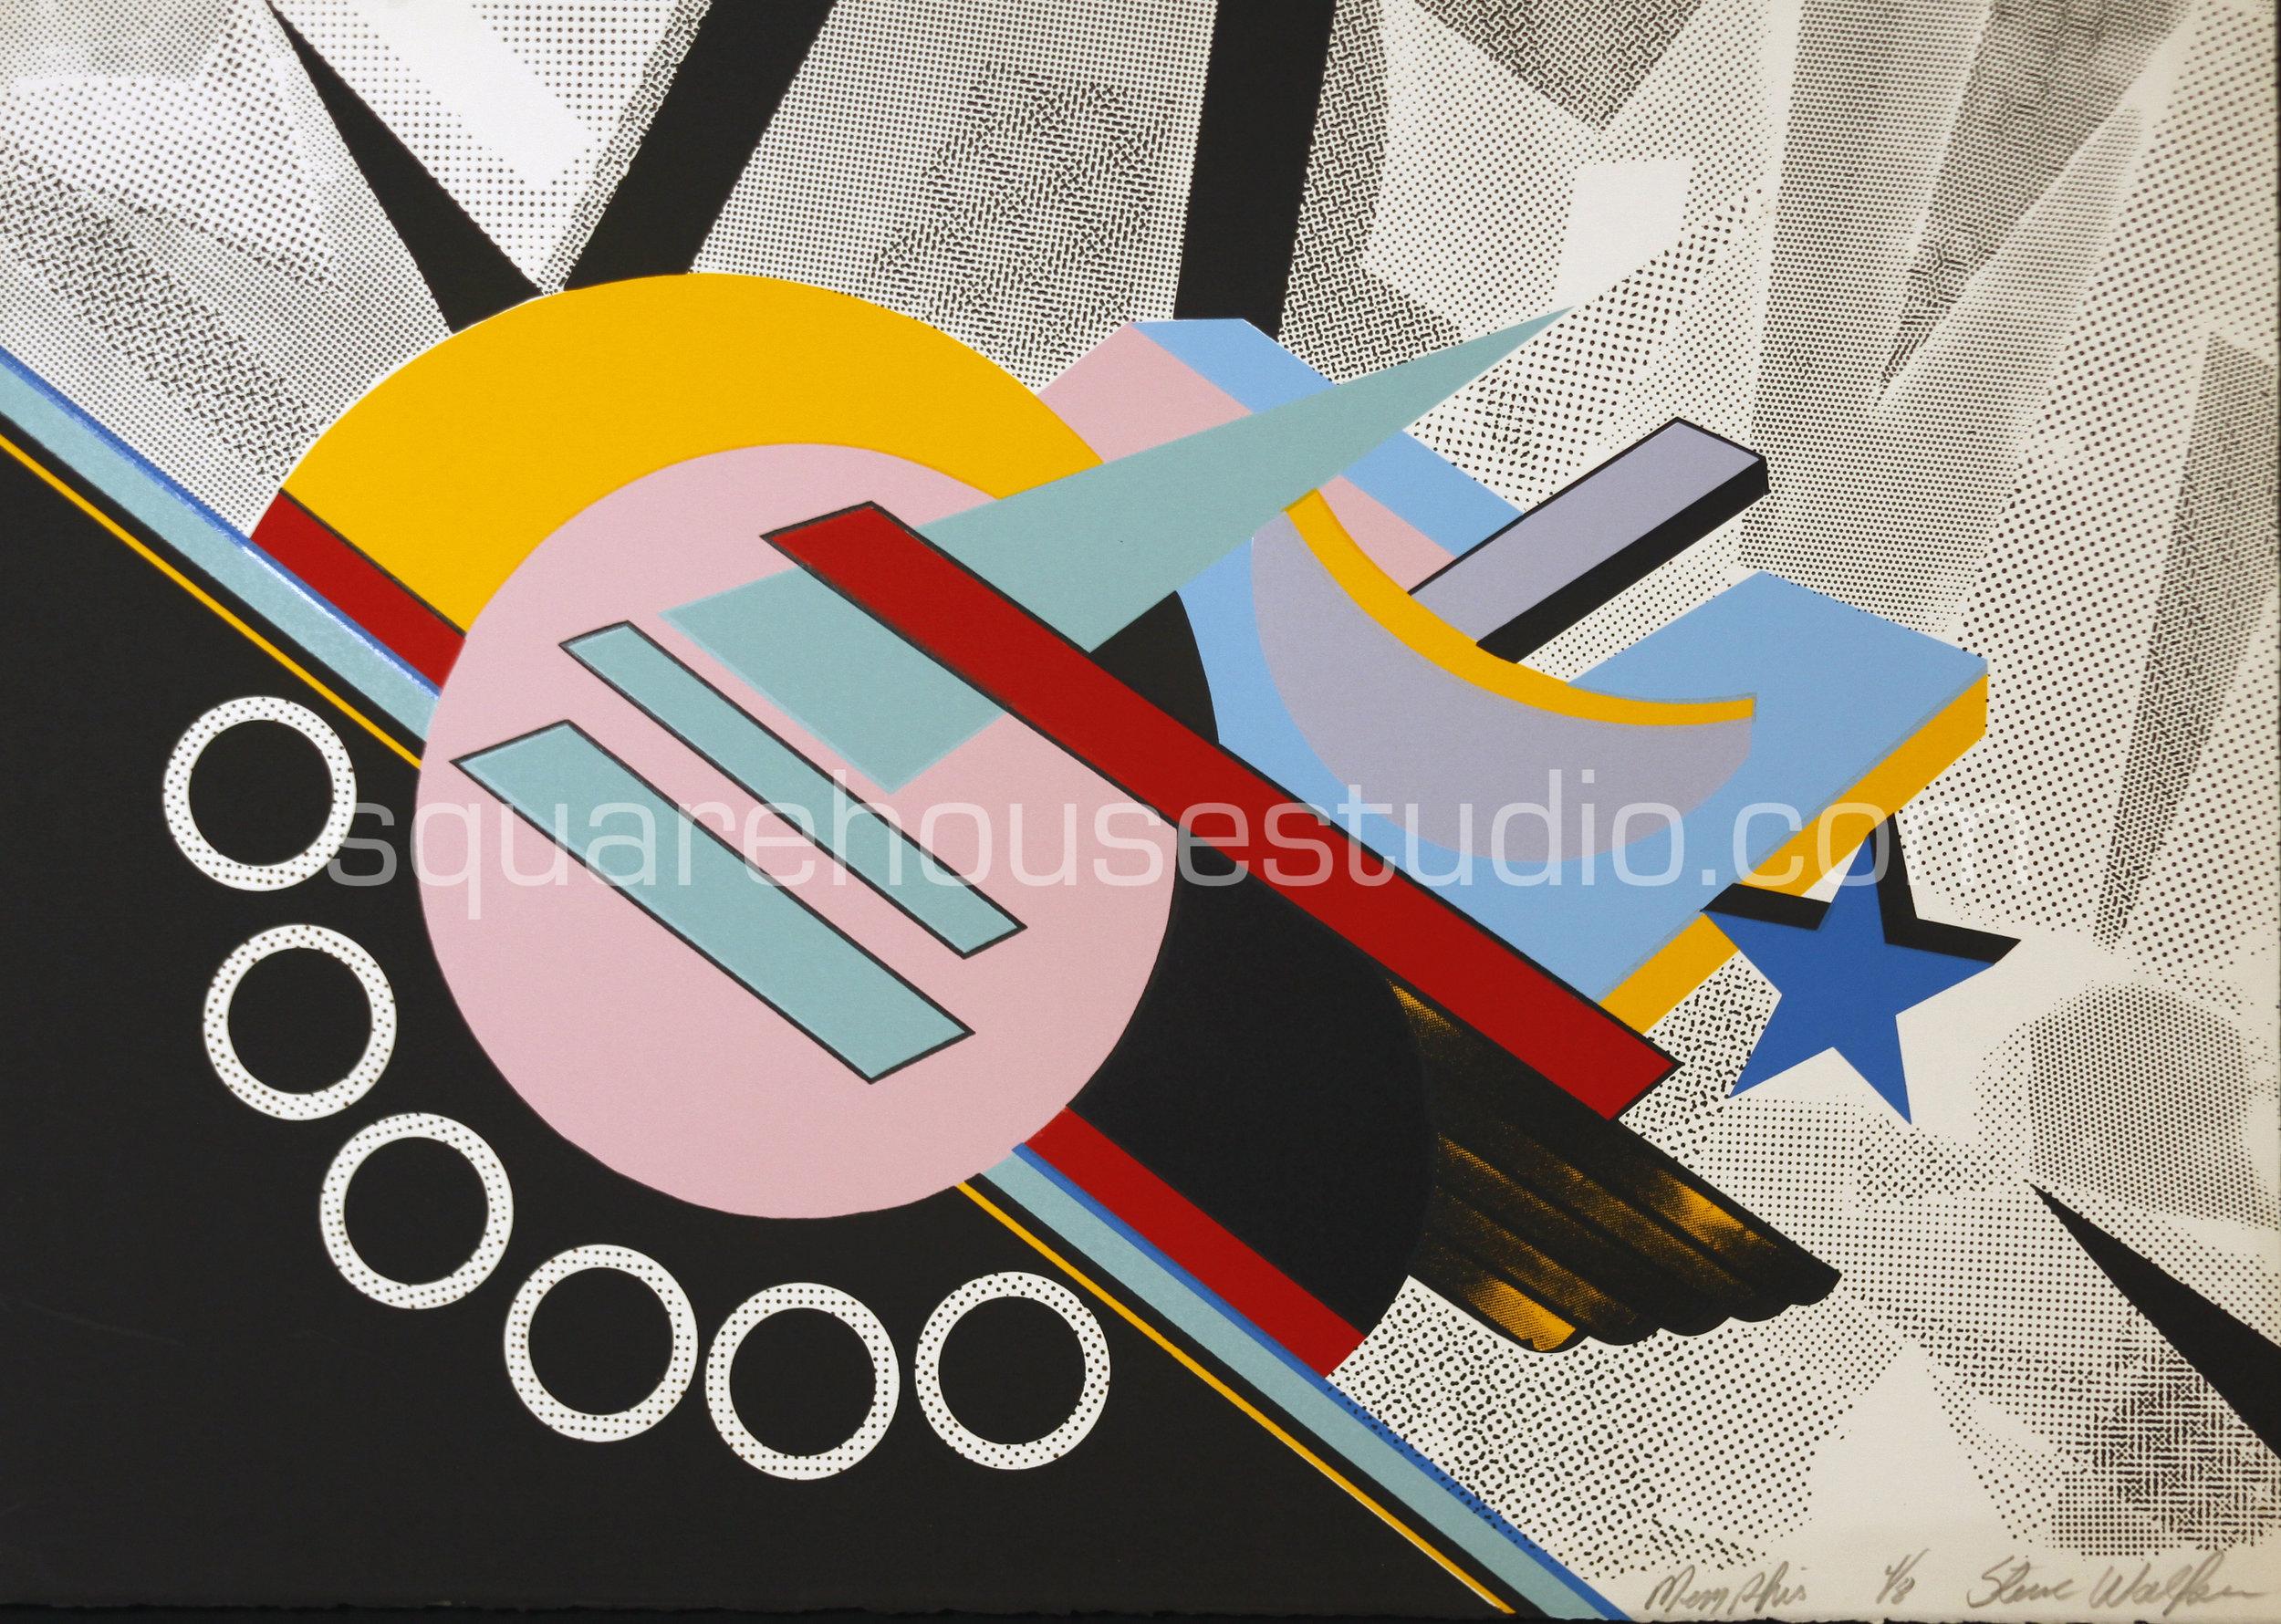 "Memphis , 22"" x 32,"" original edition, $625 framed / $475 unframed, Available as giclée print—$450 framed / $300 unframed"